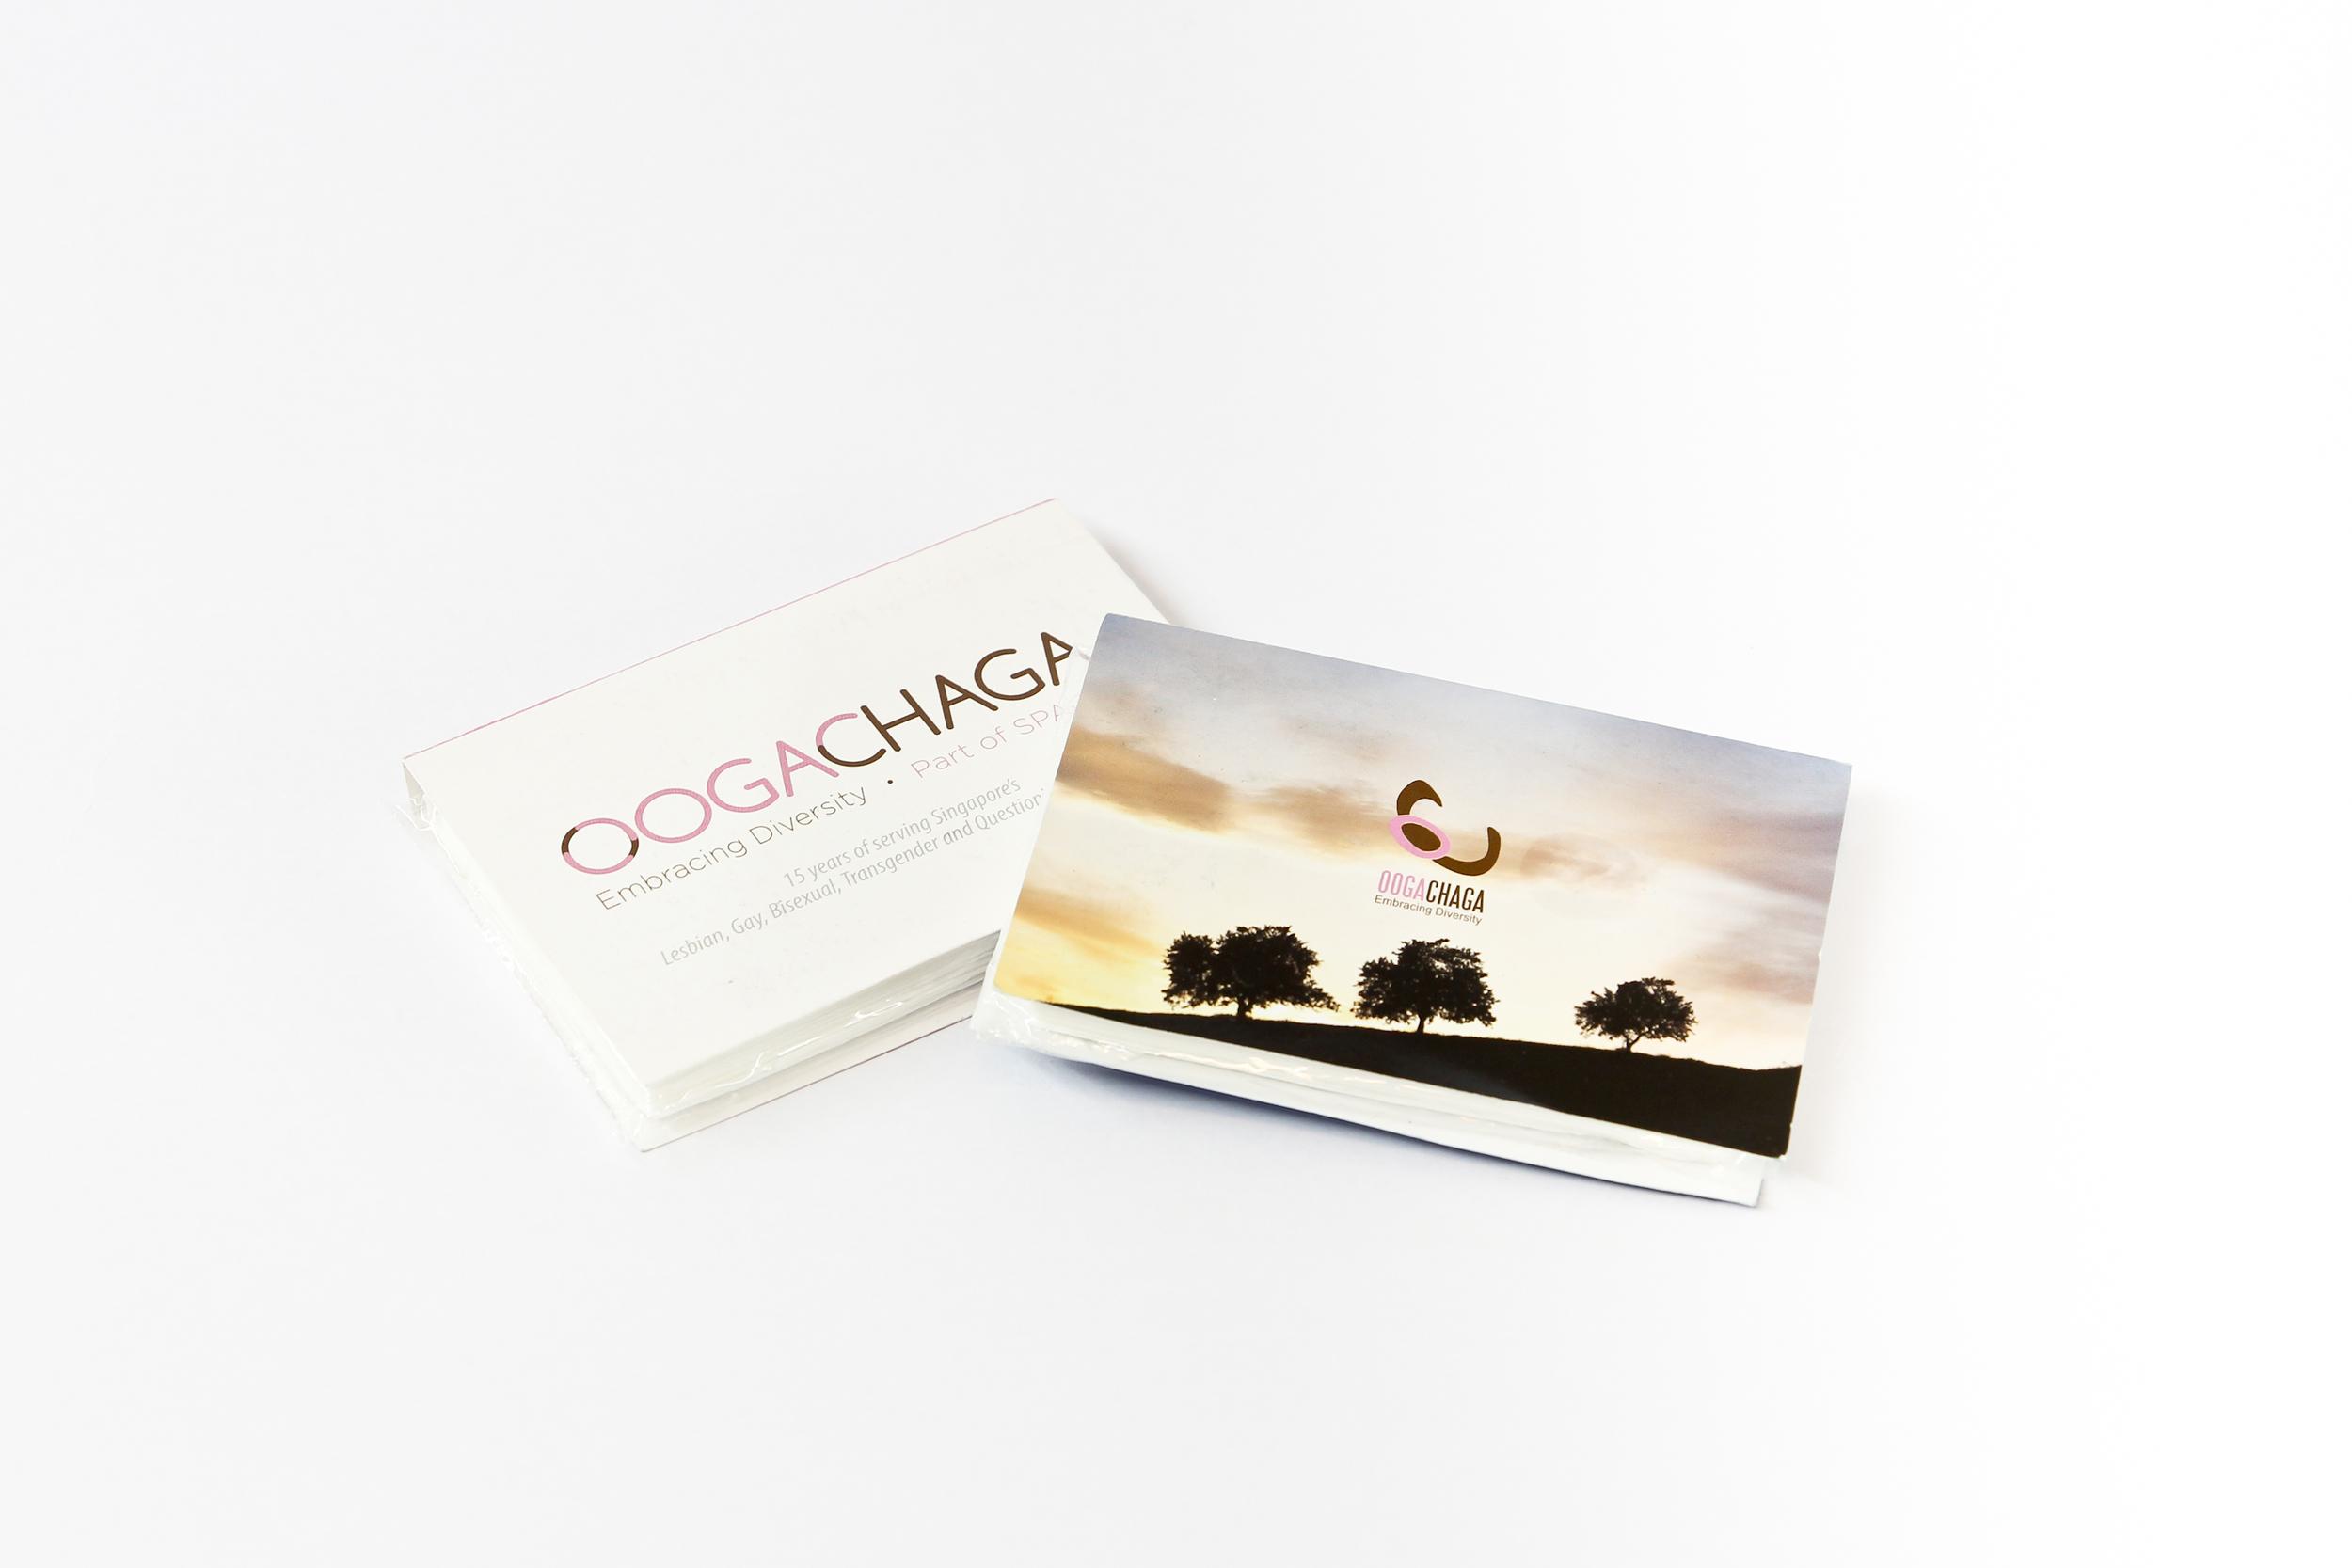 'Oogachaga' (organisation) tissue packets